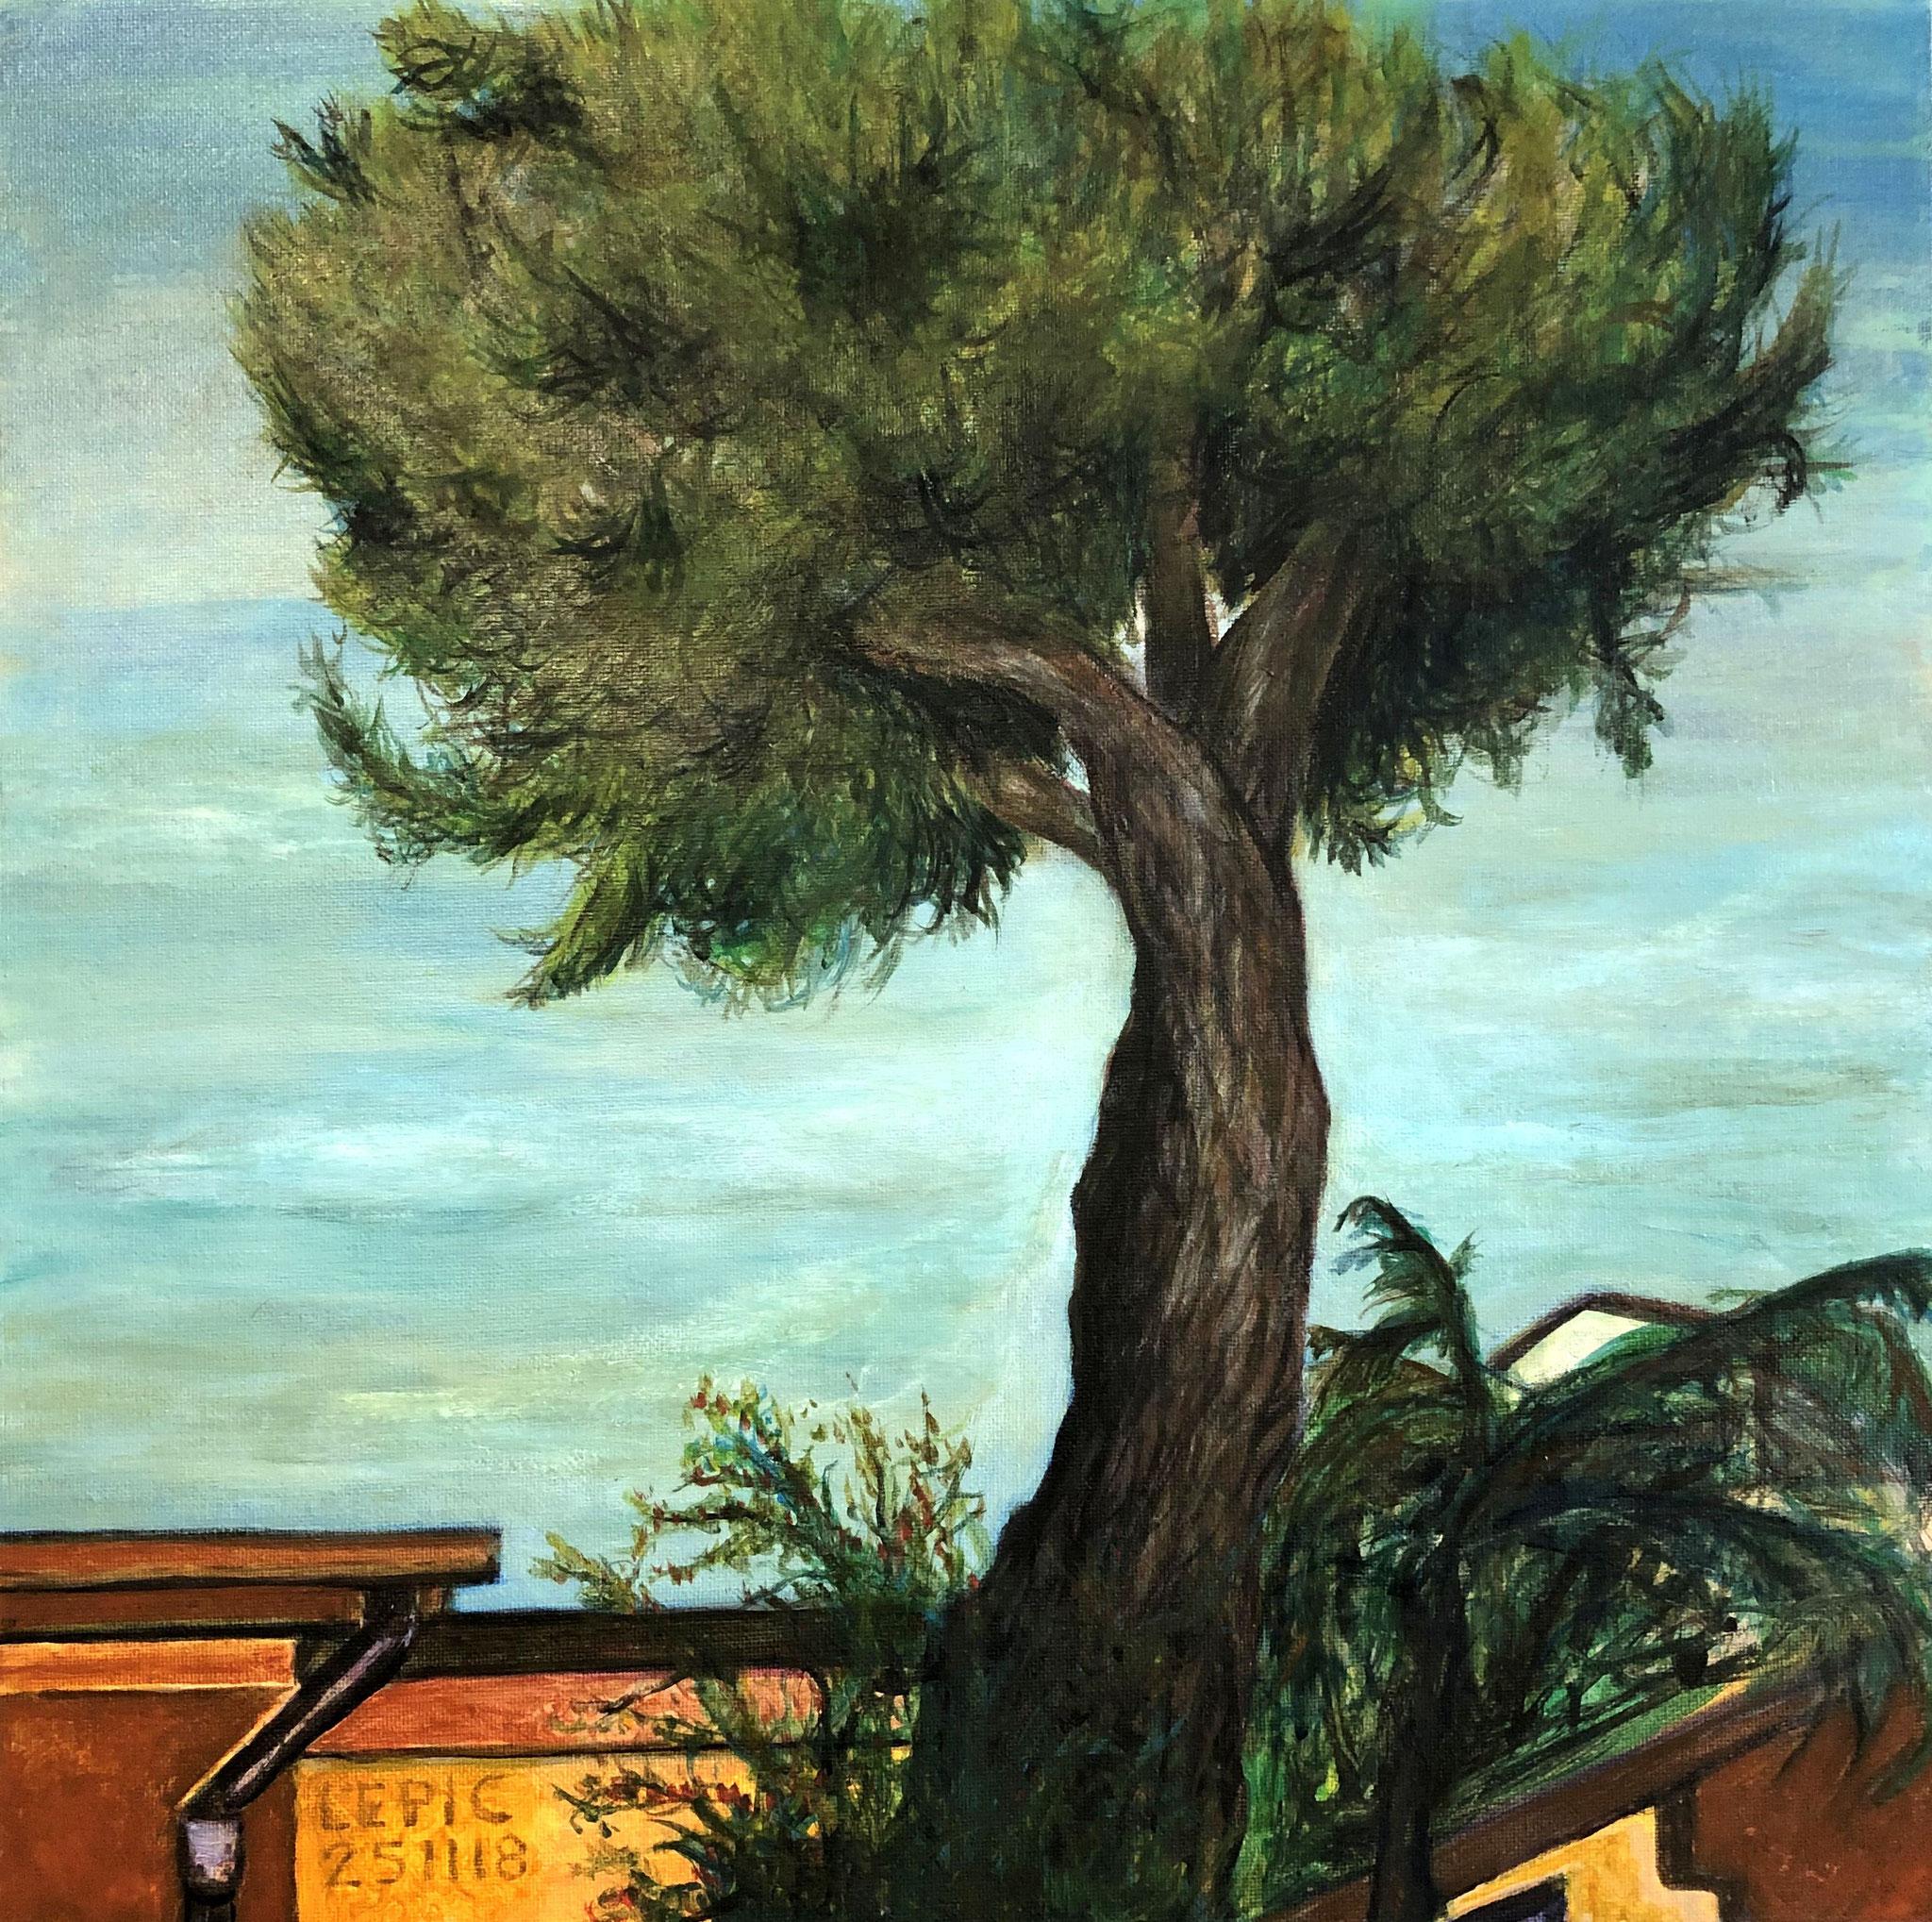 FIRENZE, PINO BRONZINO      Acryl auf Leinwand - 40 x 40 cm